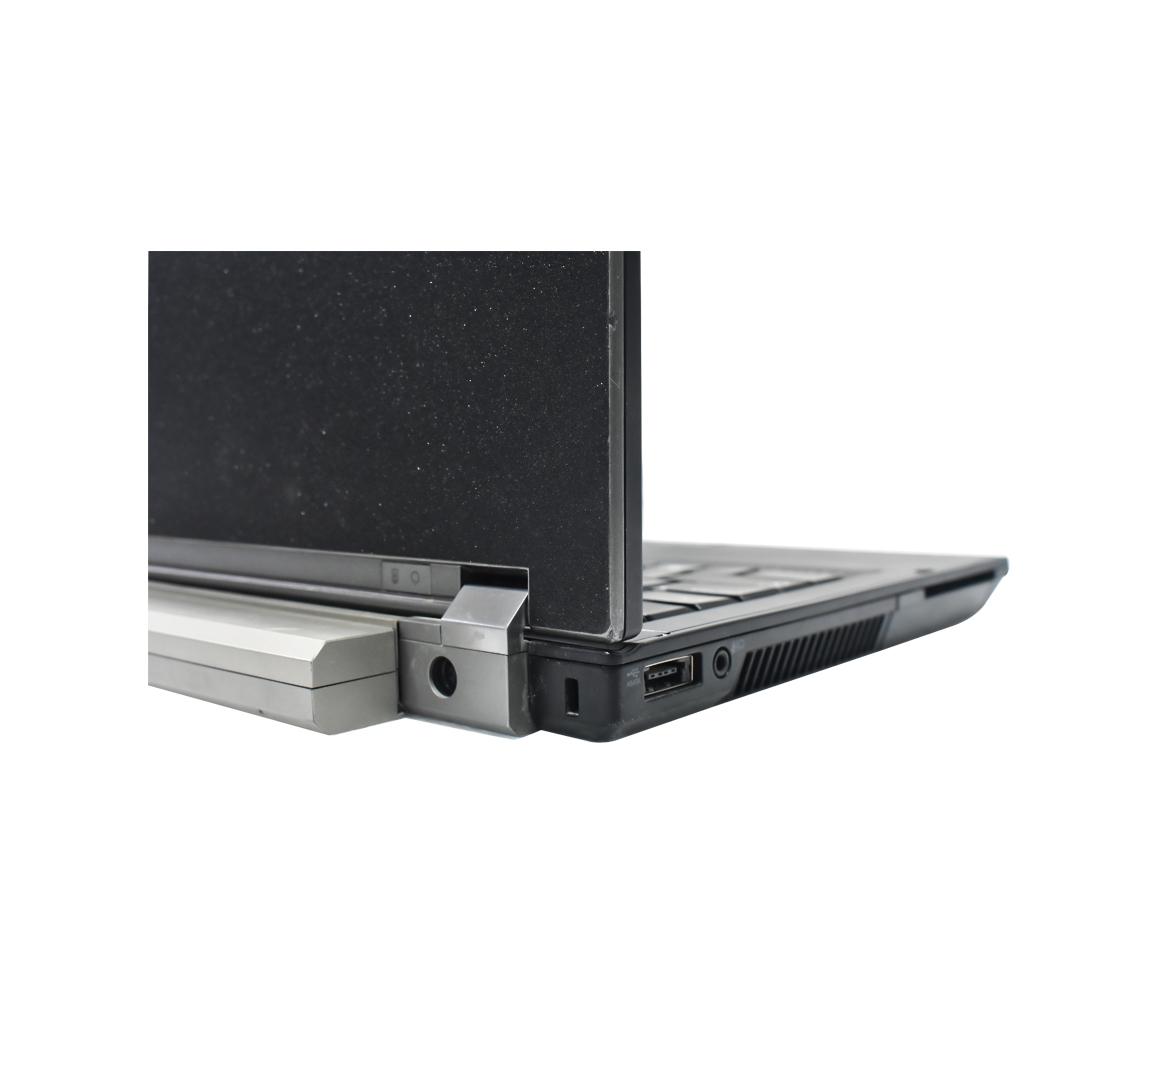 Dell Latitude E4310 Business Laptop, INTEL(R)CORE(TM) I5-M 520 CPU, 4GB DDR3 SODIMM RAM, 500GB SATA 2.5 Hard, 13.3 inch Display (Refurbished)